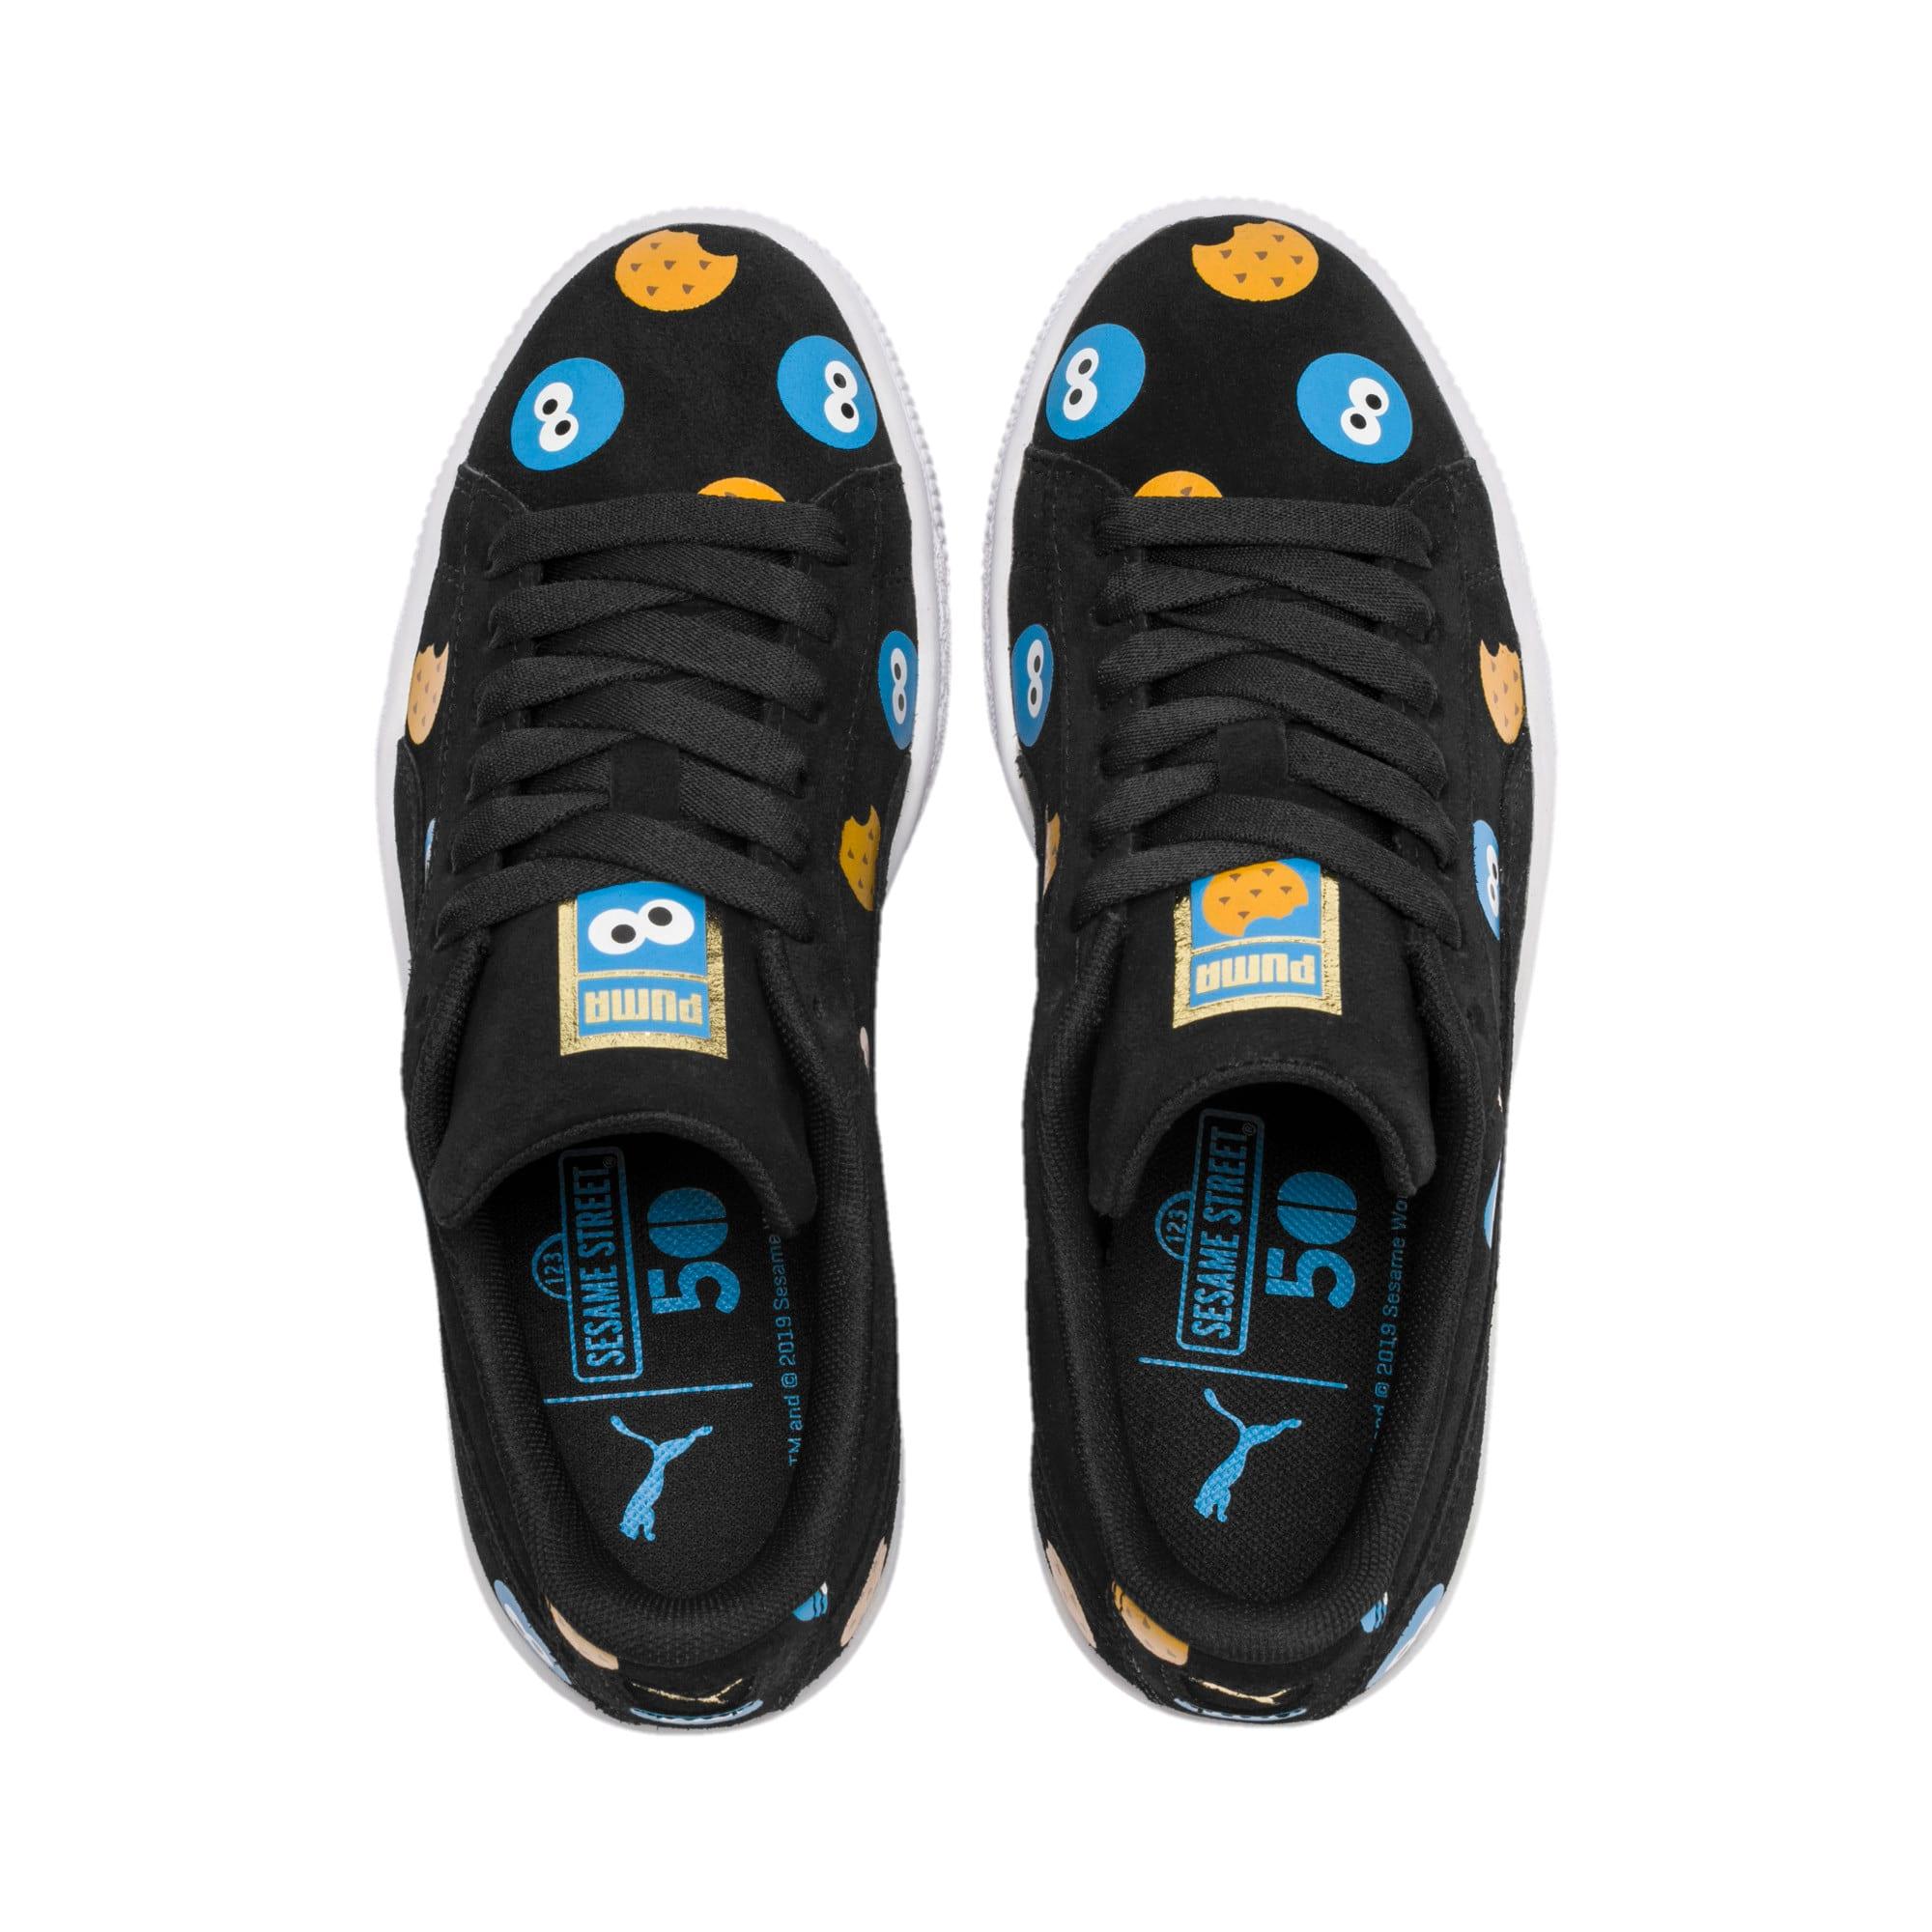 Thumbnail 5 of PUMA x SESAME STREET 50 Suede Badge Sneakers JR, Puma Black-Bleu Azur, medium